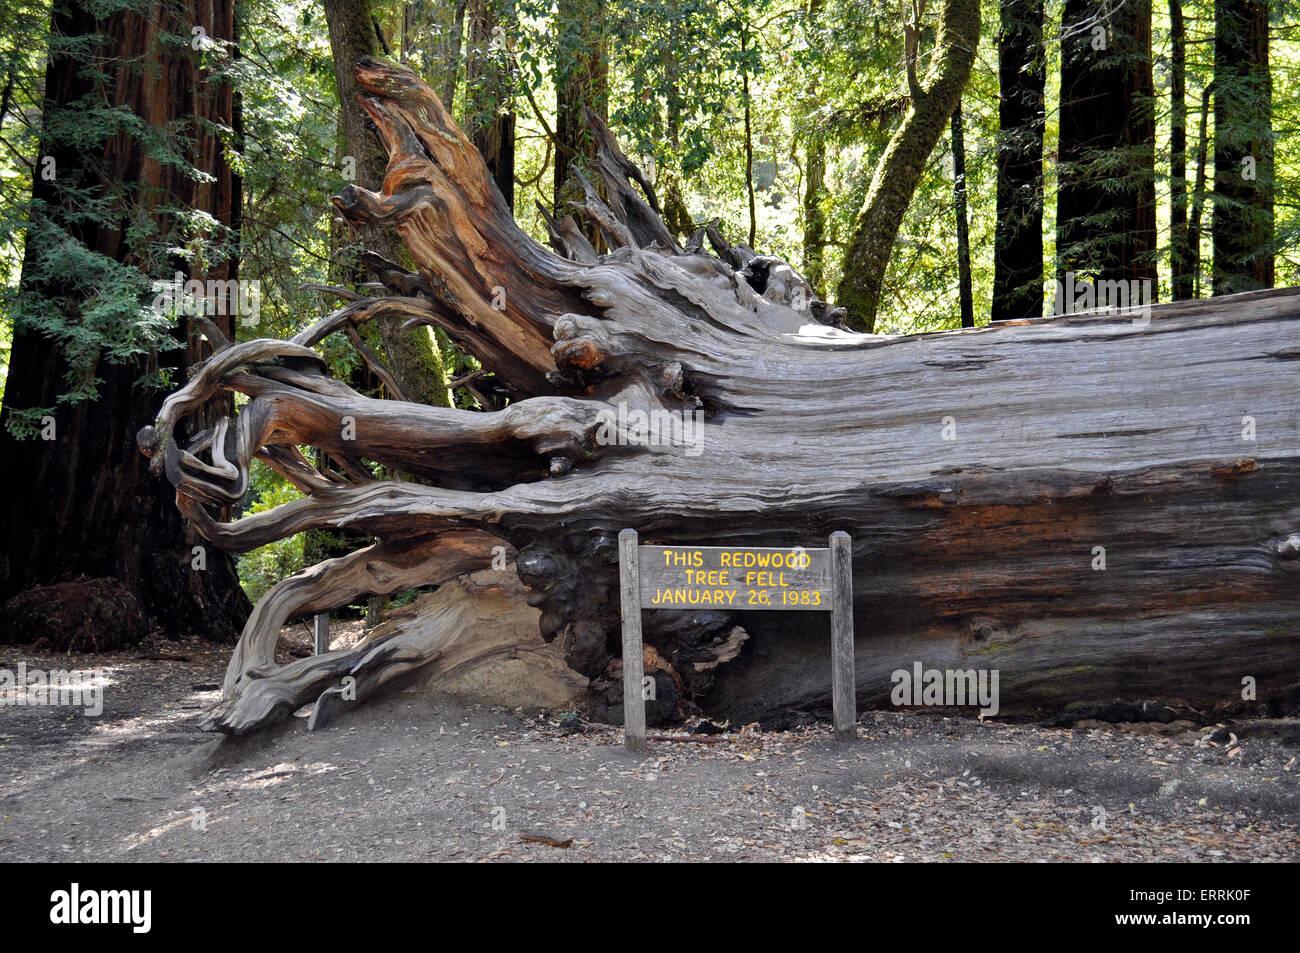 Fallen Coast Redwood tree, Big Basin Redwoods State Park, California - Stock Image